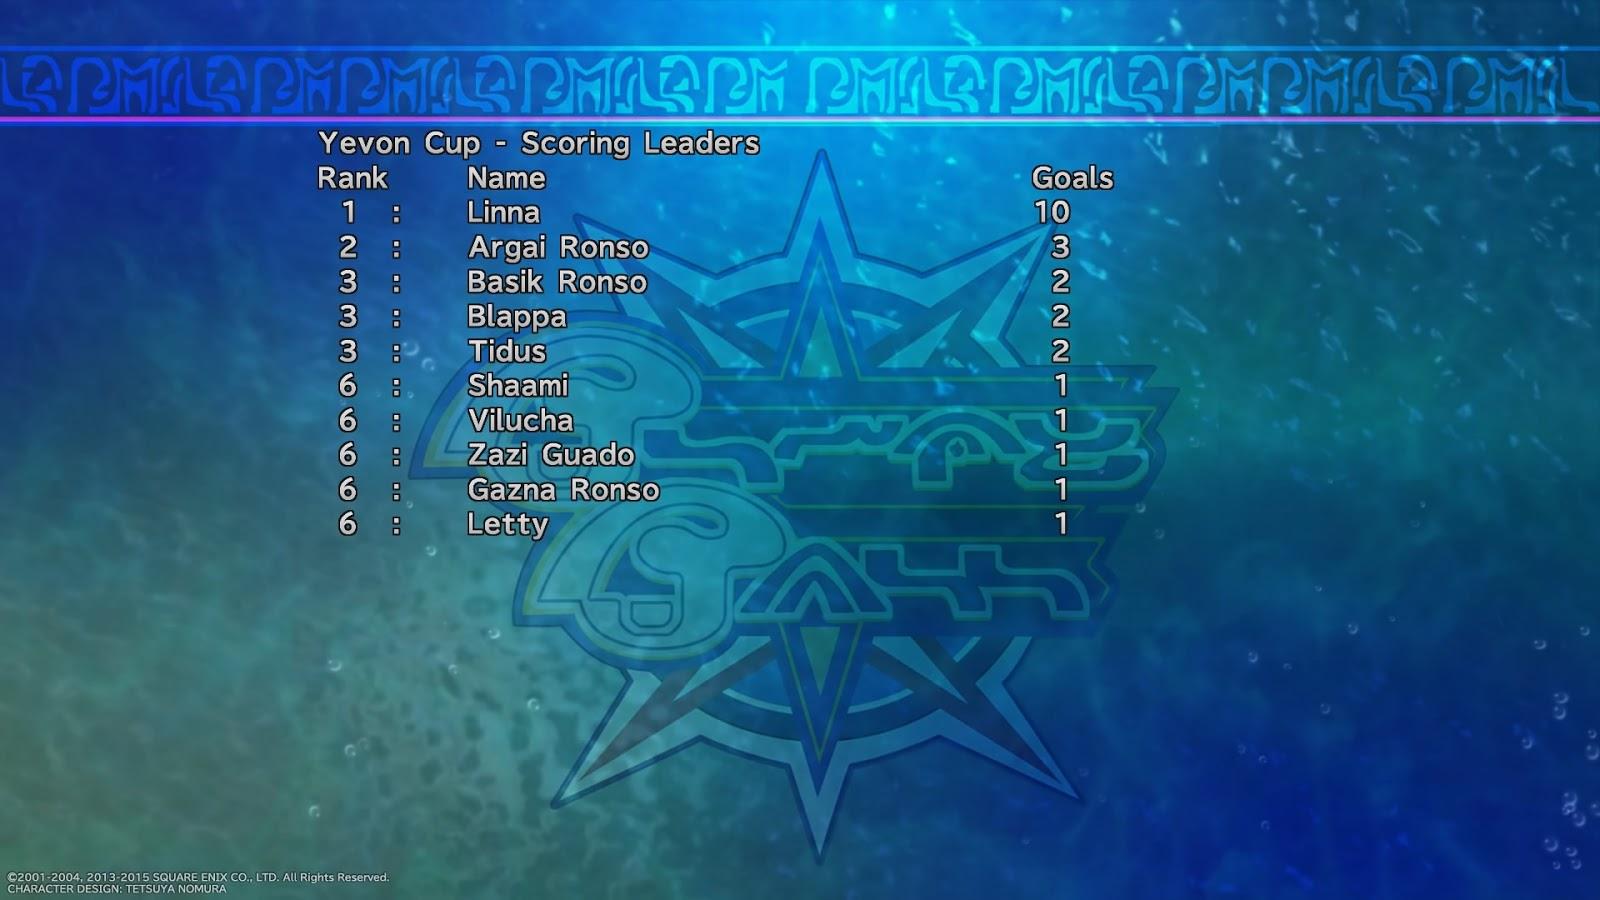 Vicsors Opinion Guide Final Fantasy X - Blitzball Kvindehold-6365